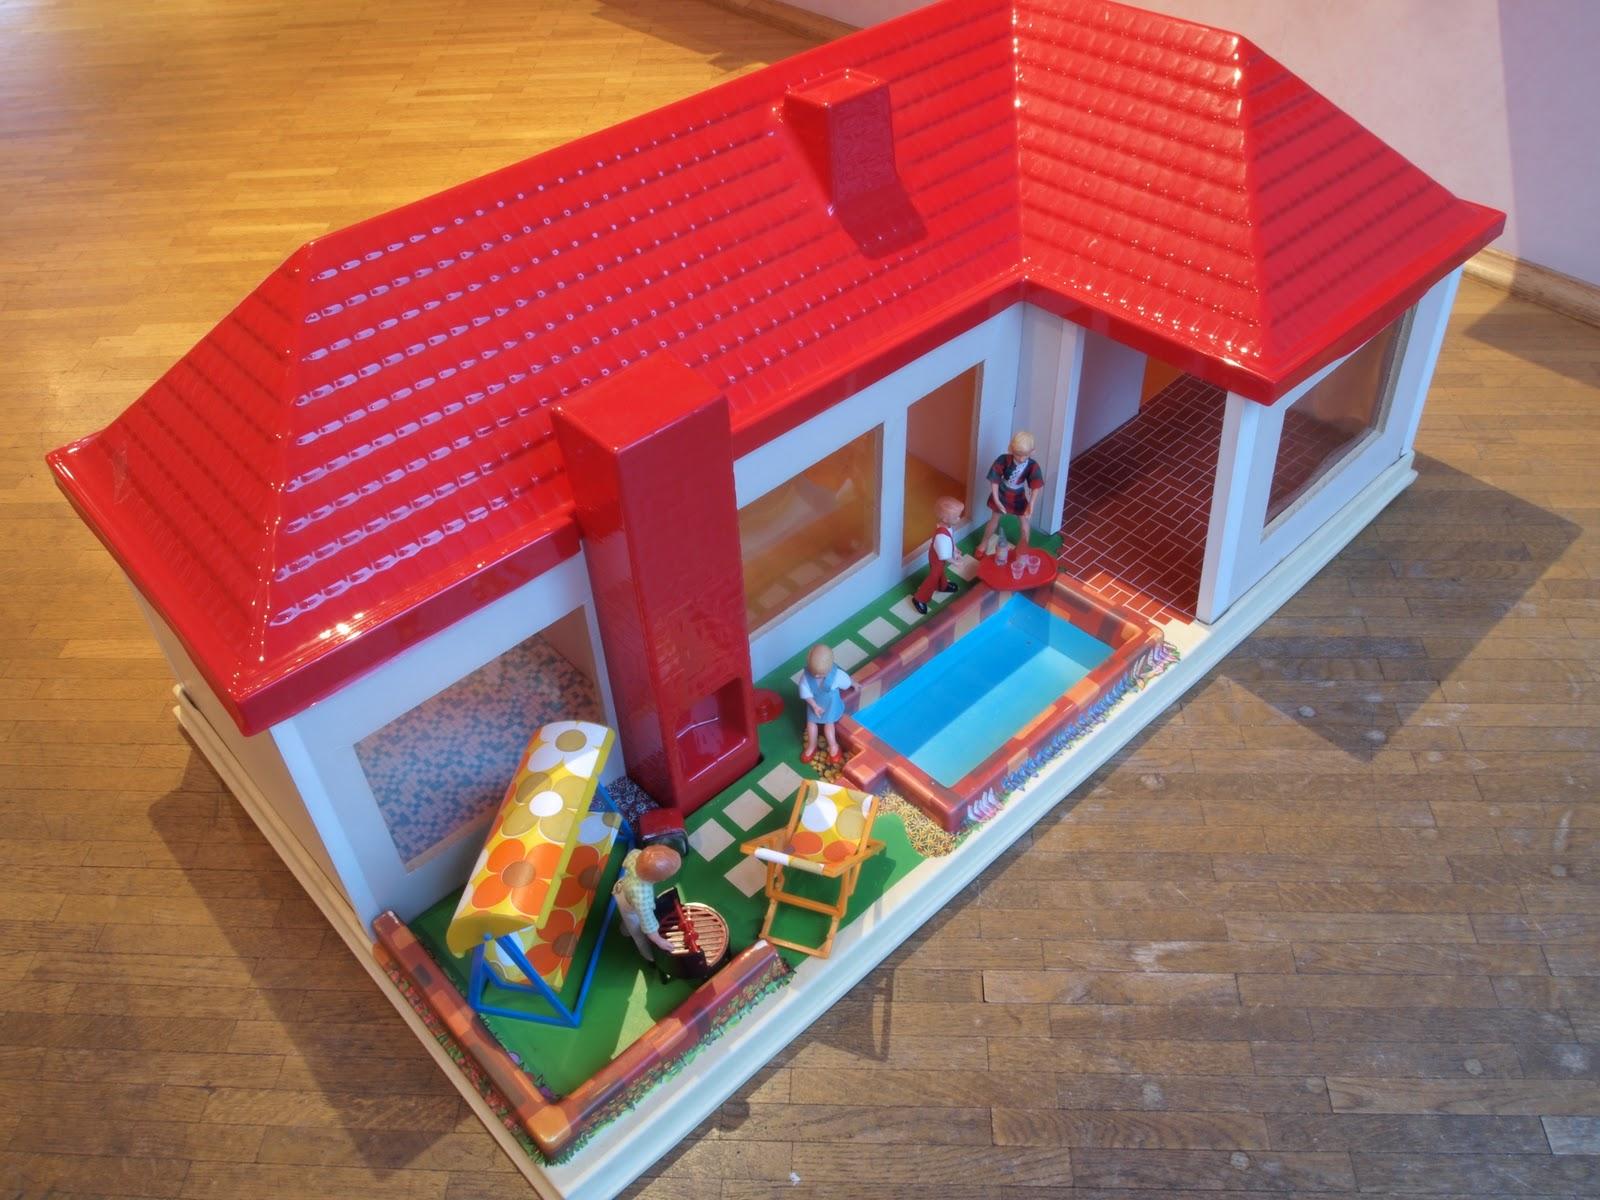 diepuppenstubensammlerin puppenhaus 1973 elfriede lipfert elka plastic dolls house. Black Bedroom Furniture Sets. Home Design Ideas